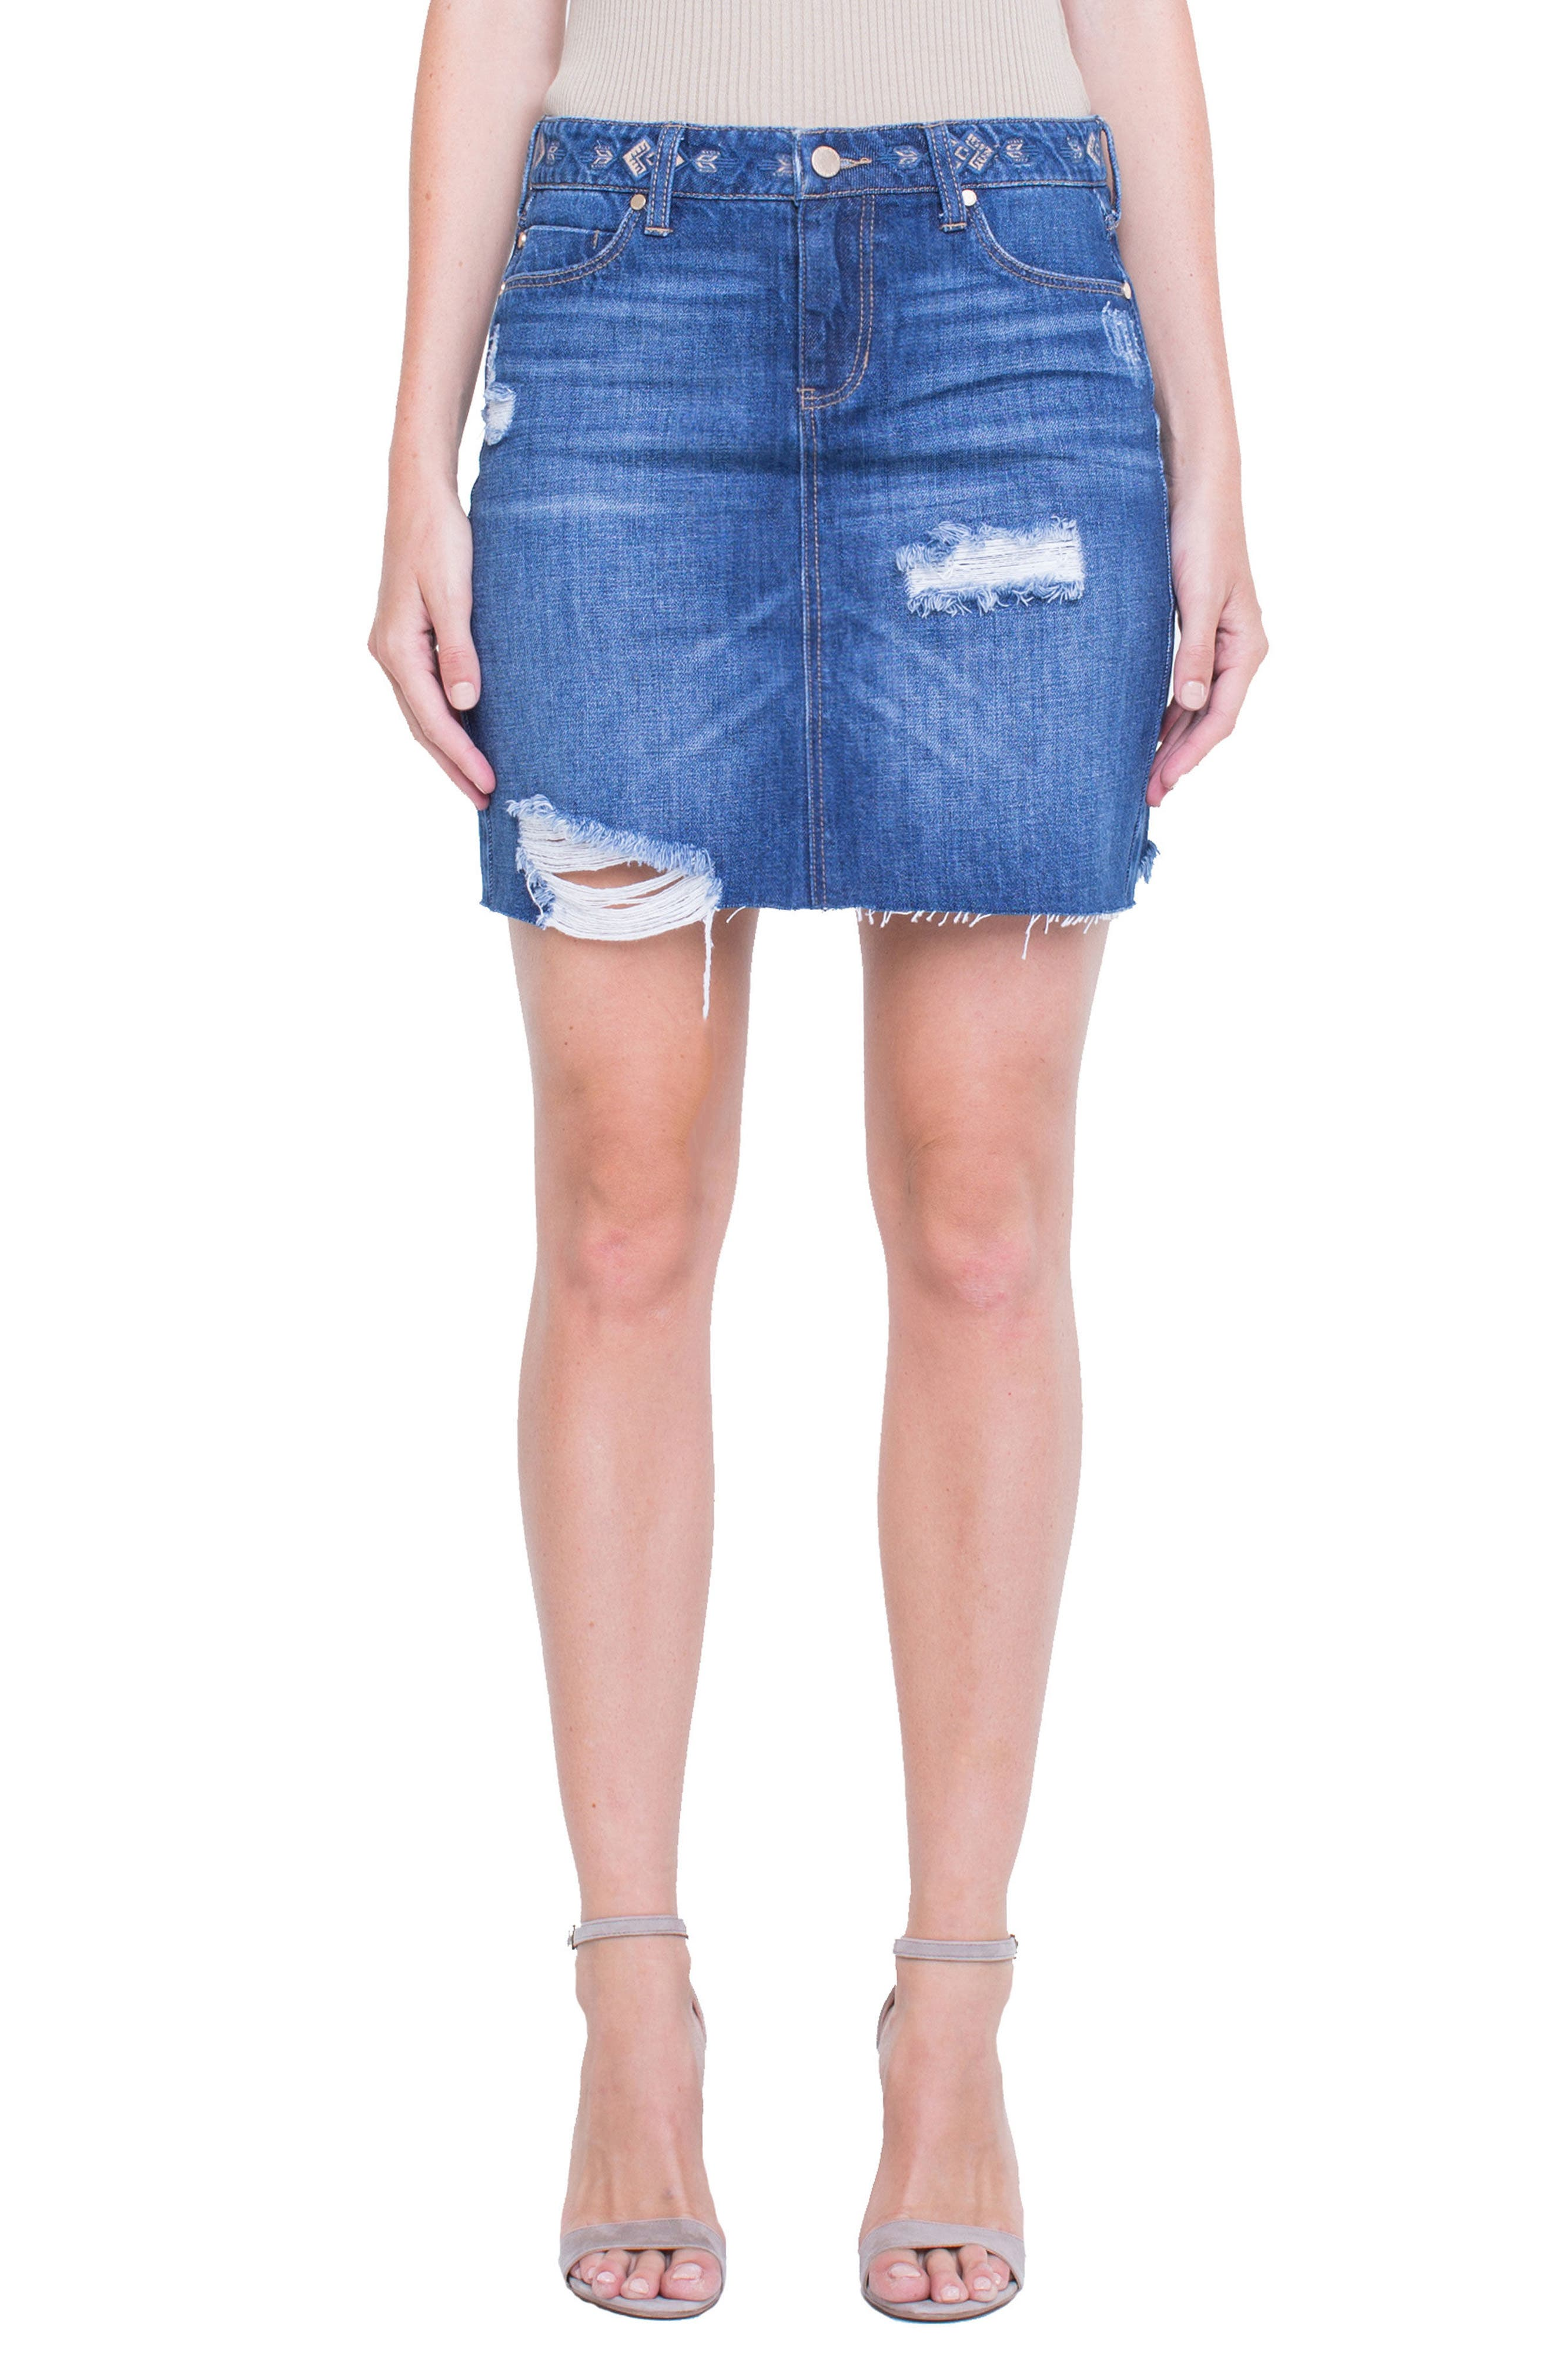 Liverpool Jeans Company Distressed Classic Miniskirt